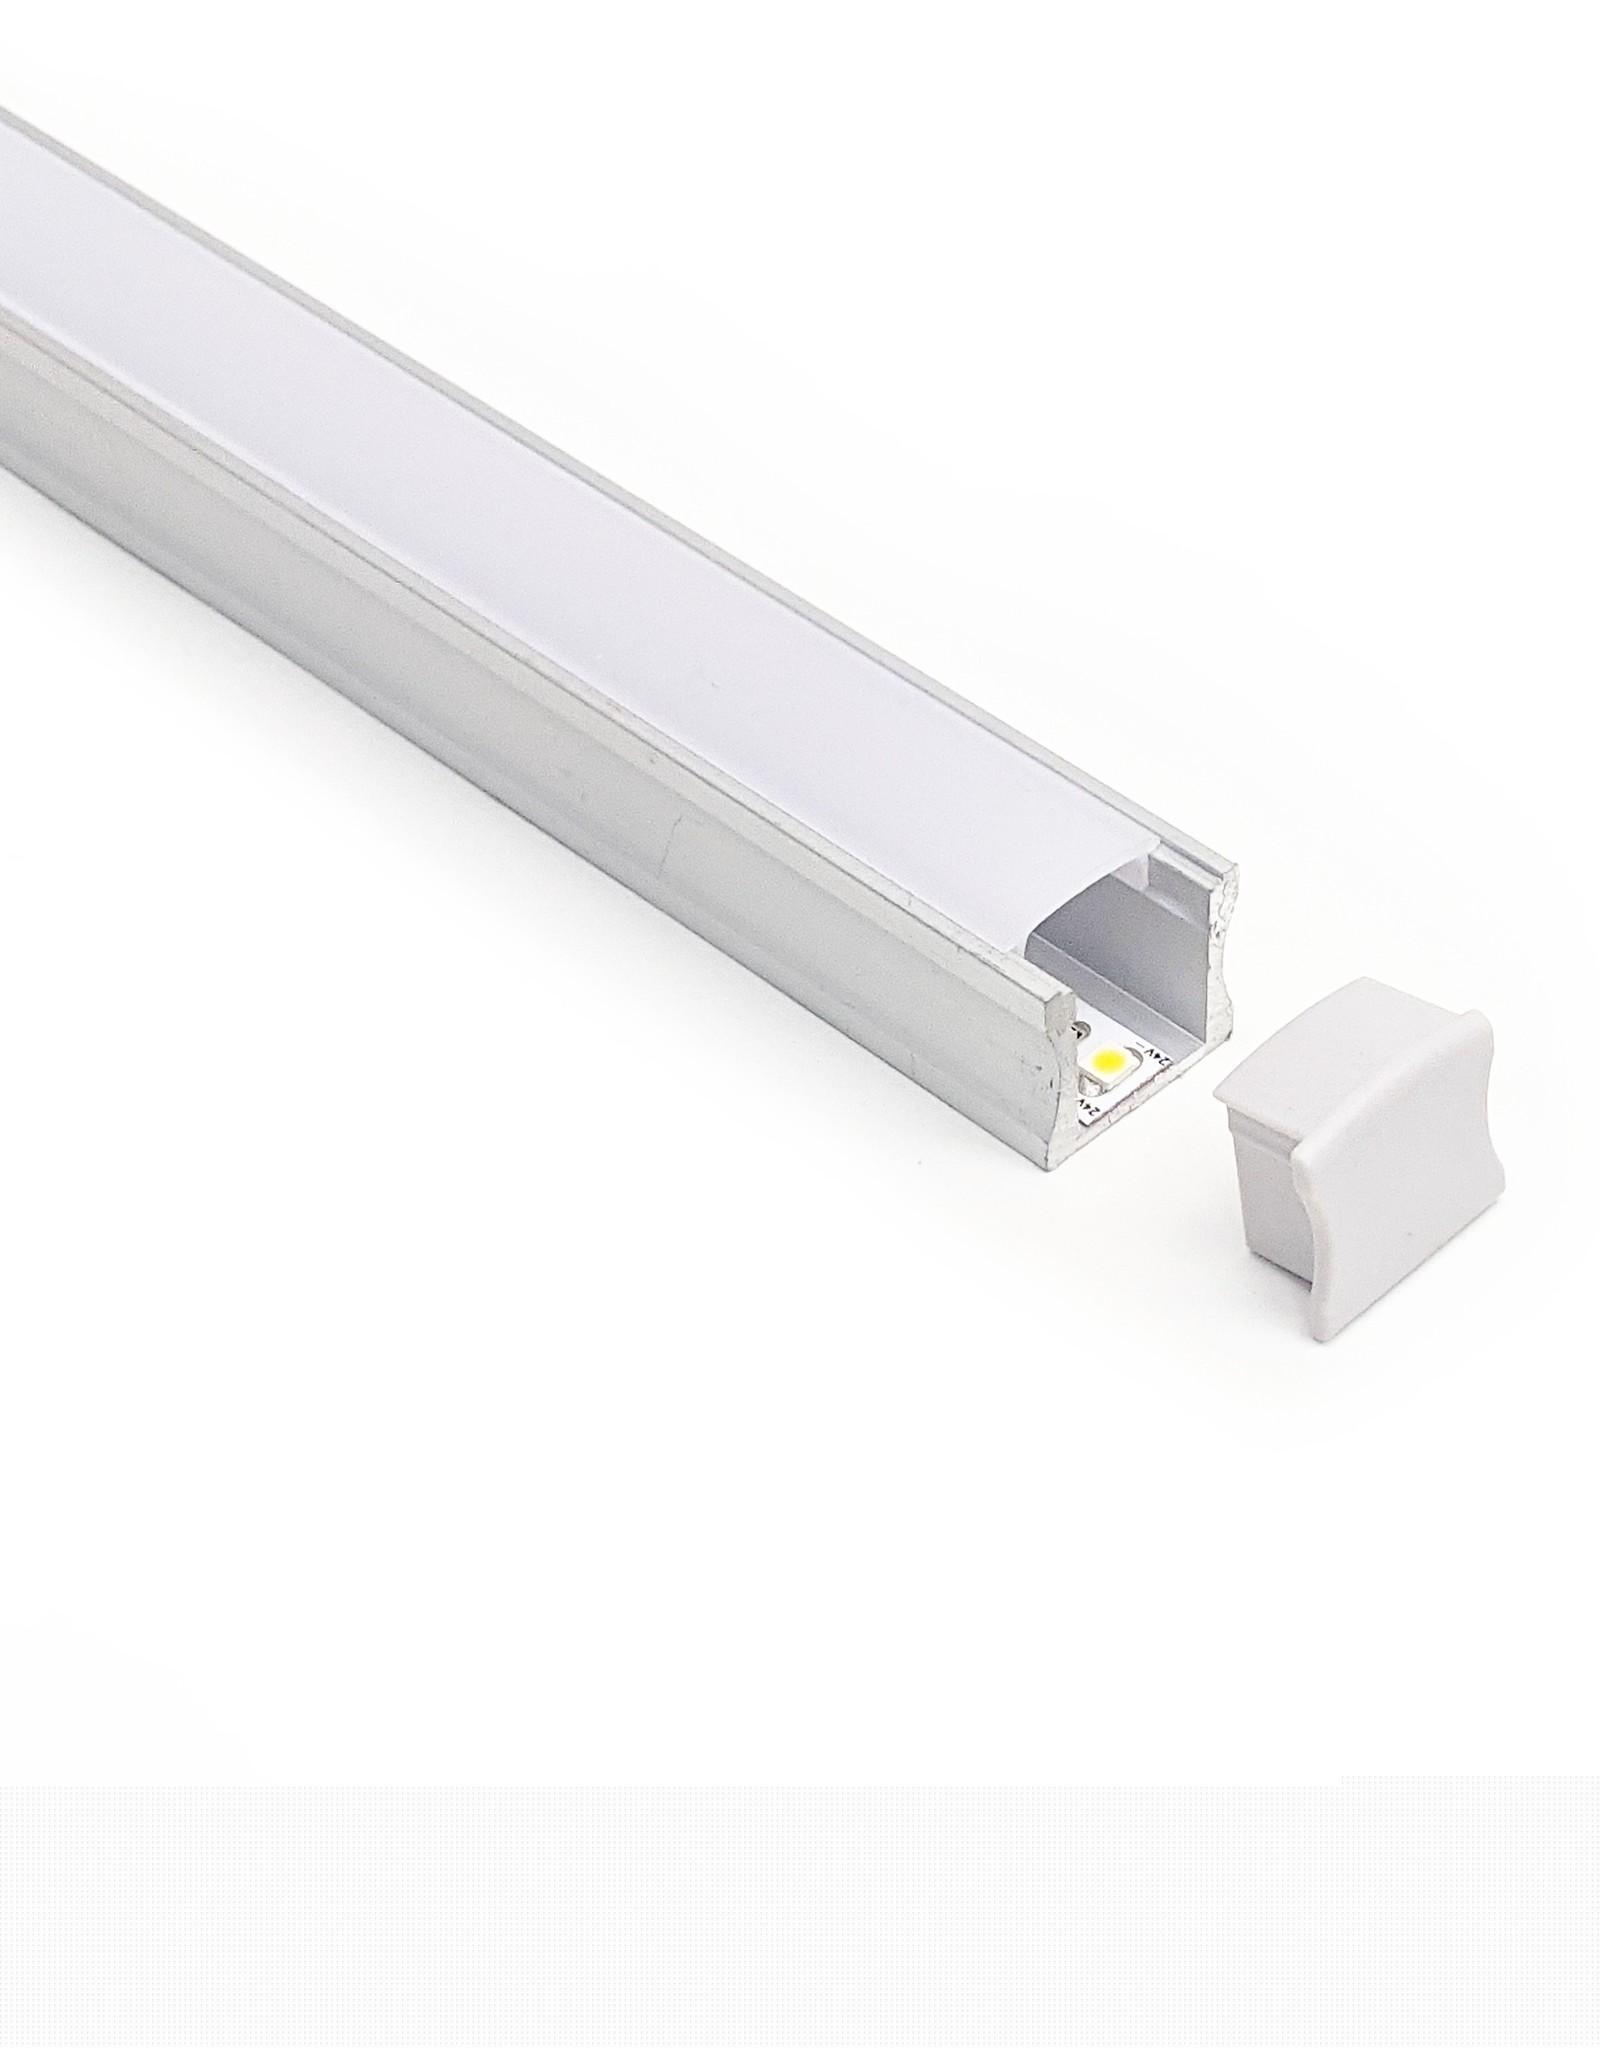 LedLed Aluminium opbouw profiel 15mm - Pro